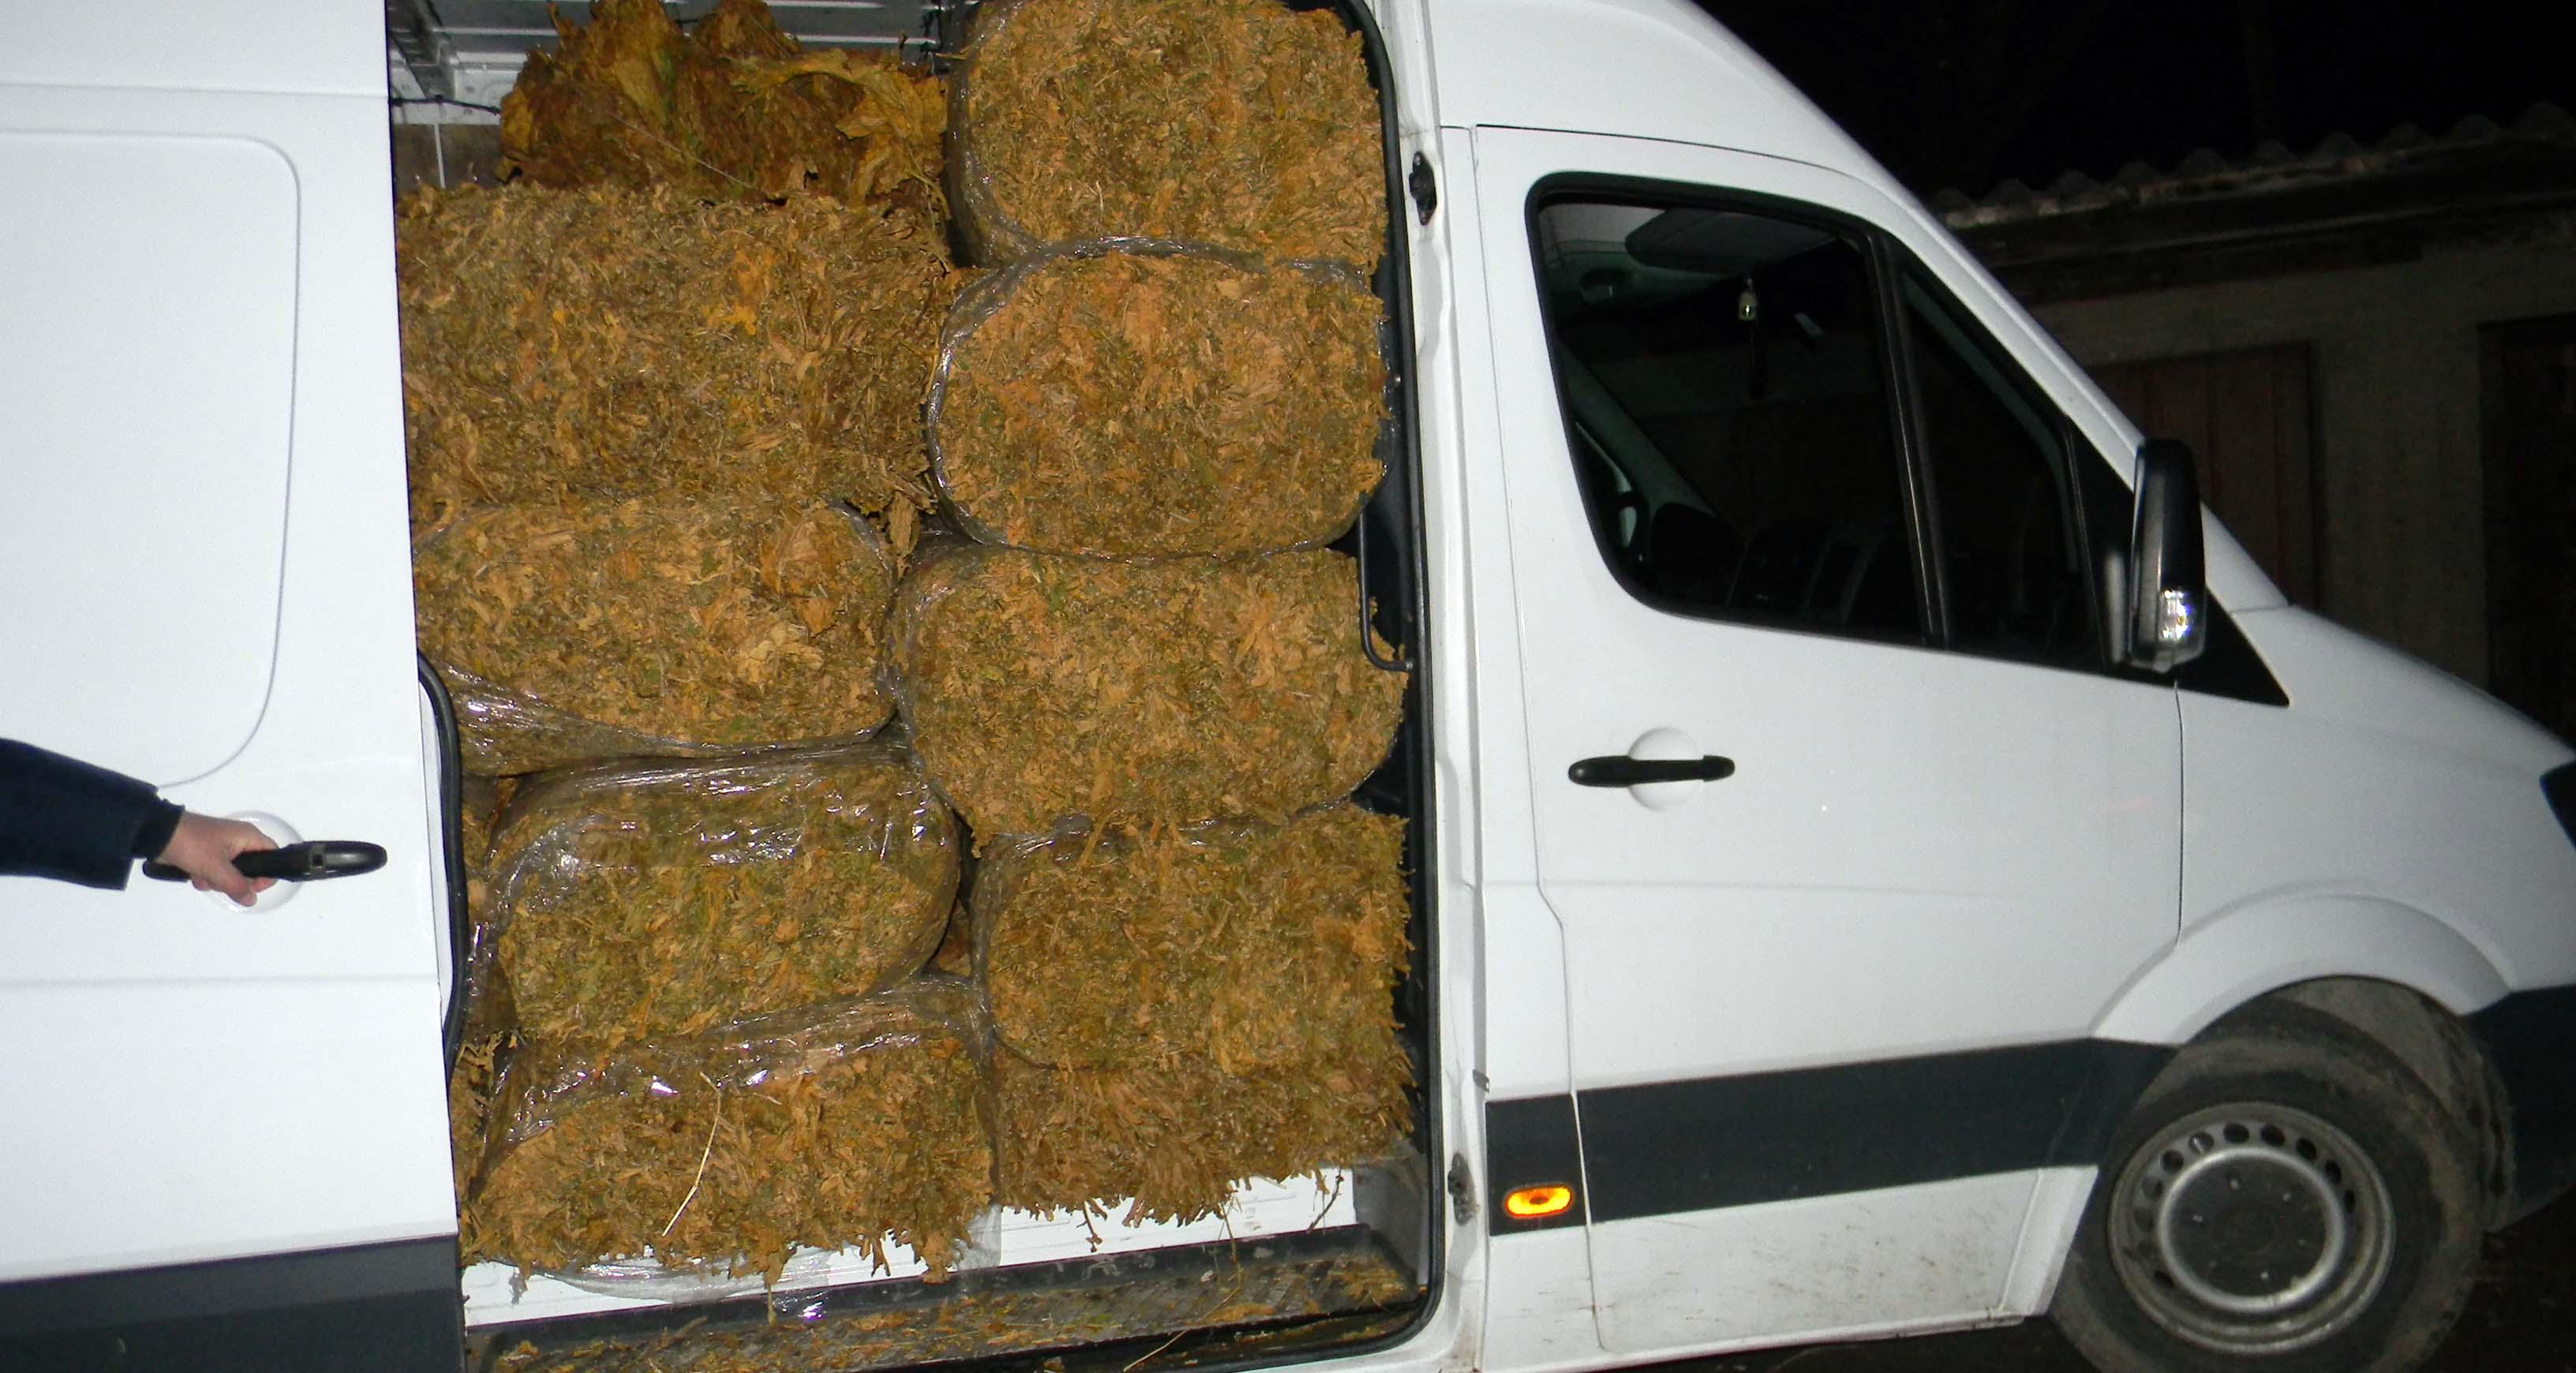 Šabac: policija zaplenila tonu i 730 kilograma duvana